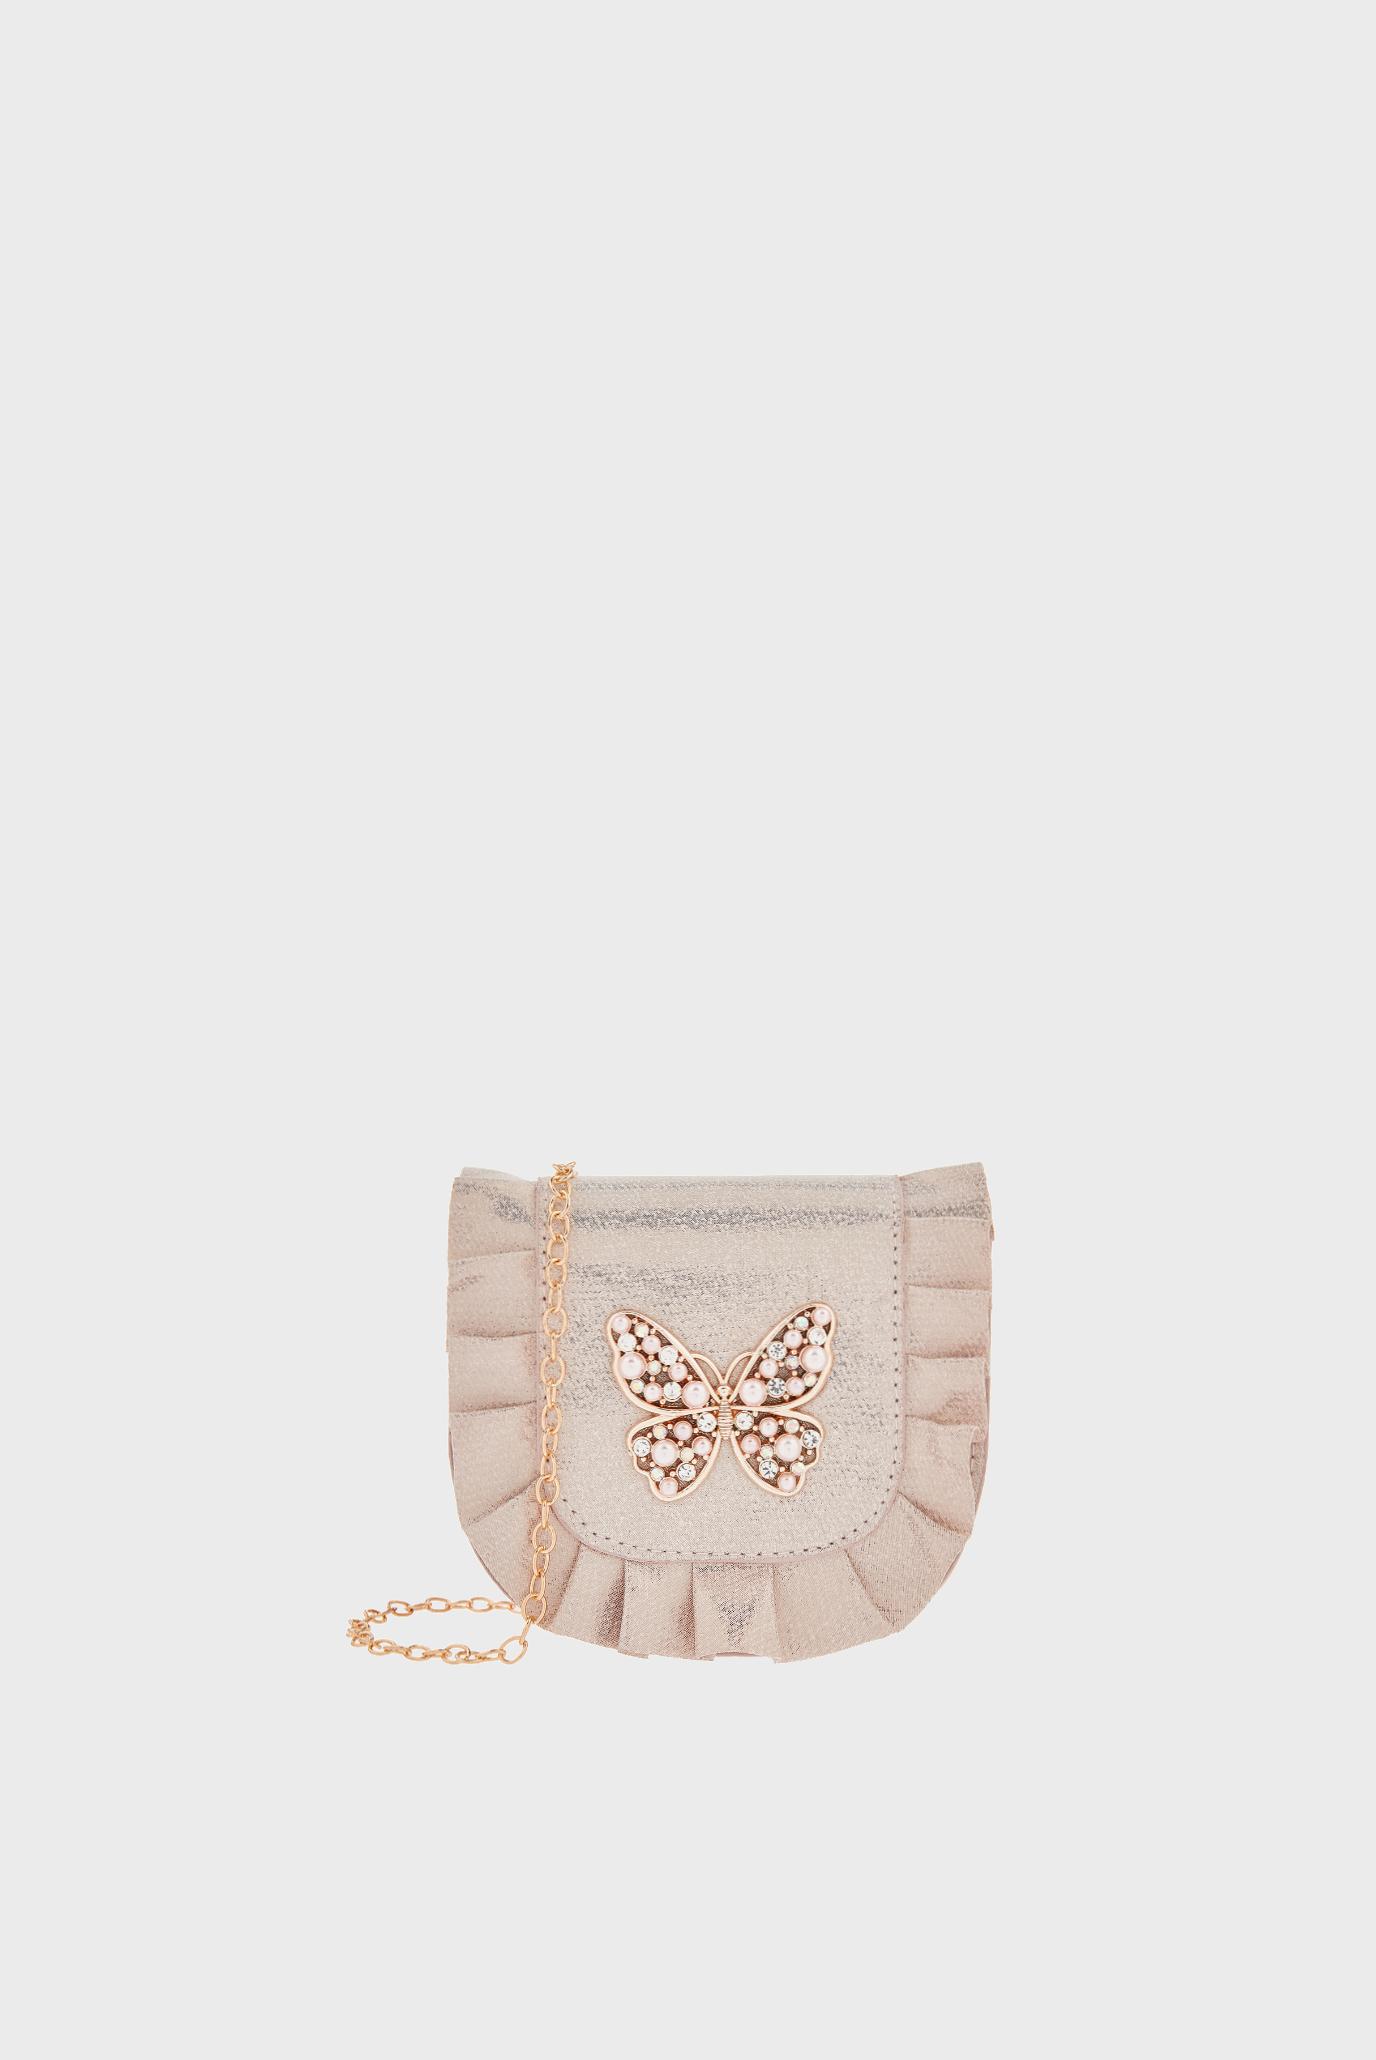 Дитяча рожева сумка Venita Pearl Bag 1